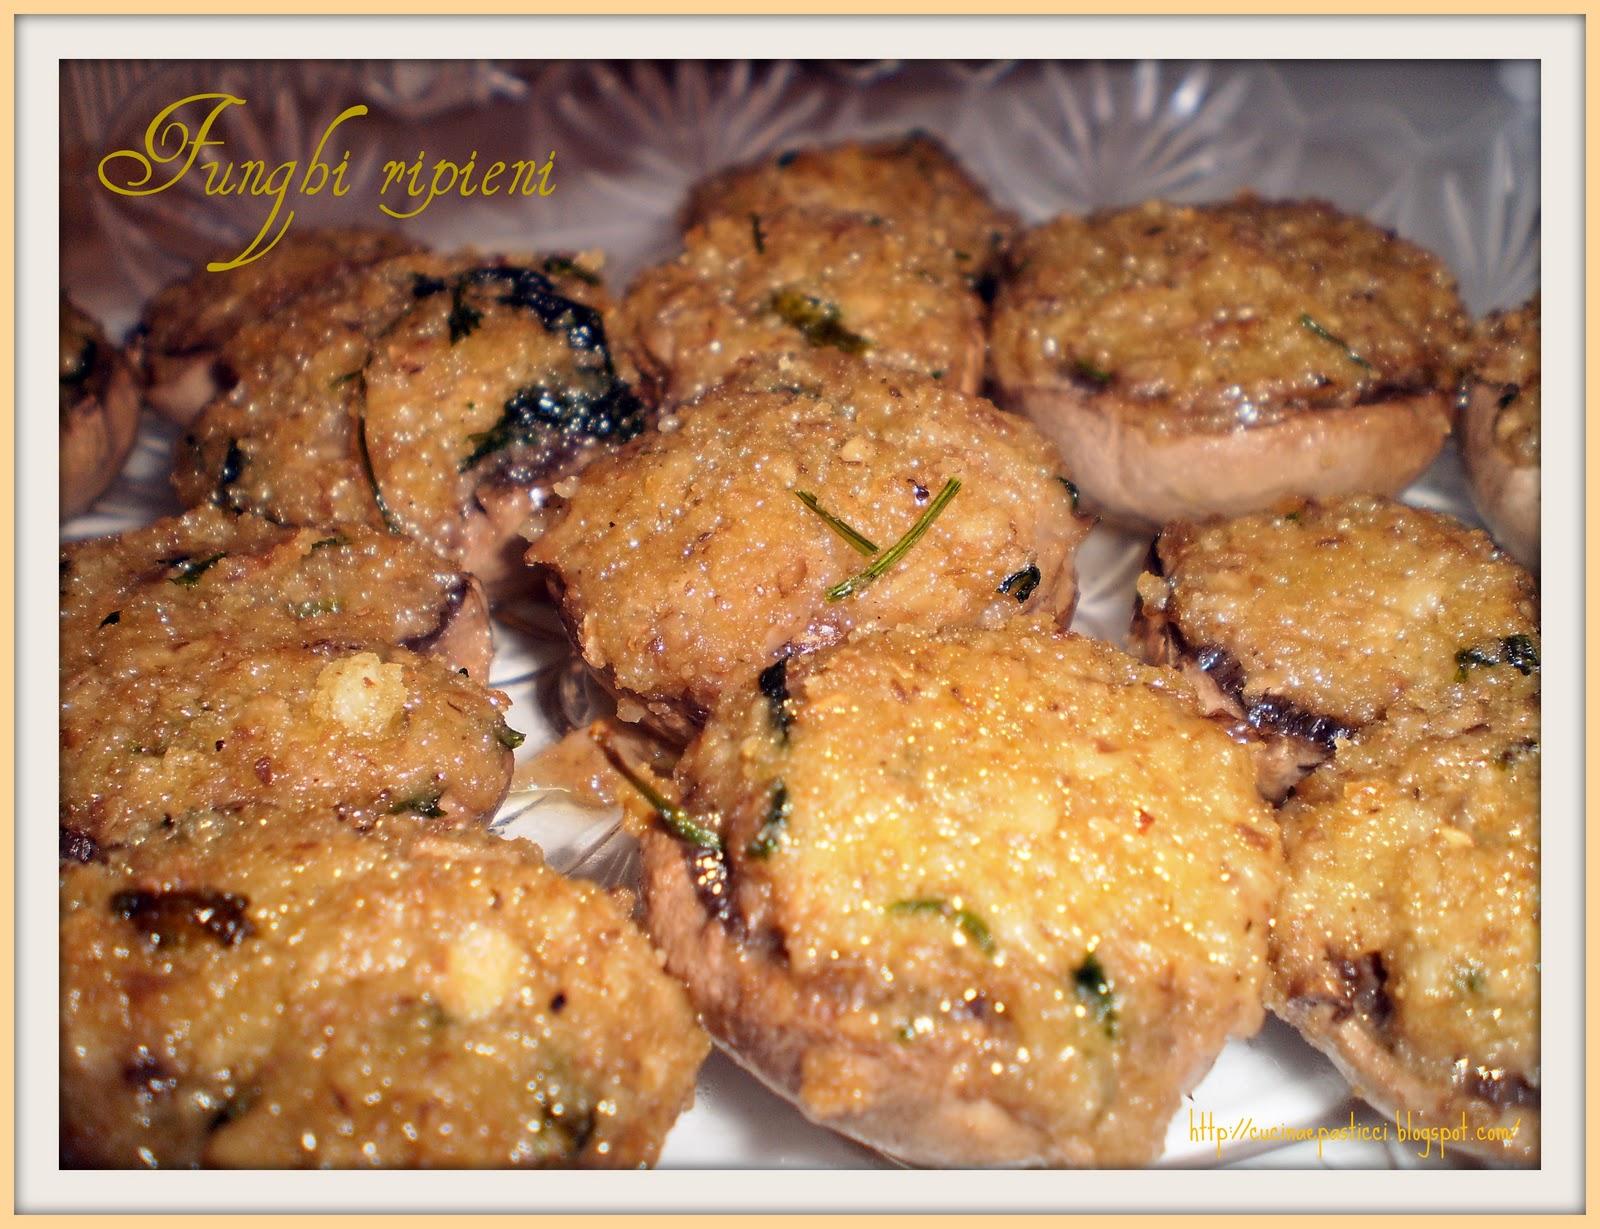 Cucina pasticci funghi ripieni - Cucina e pasticci ...